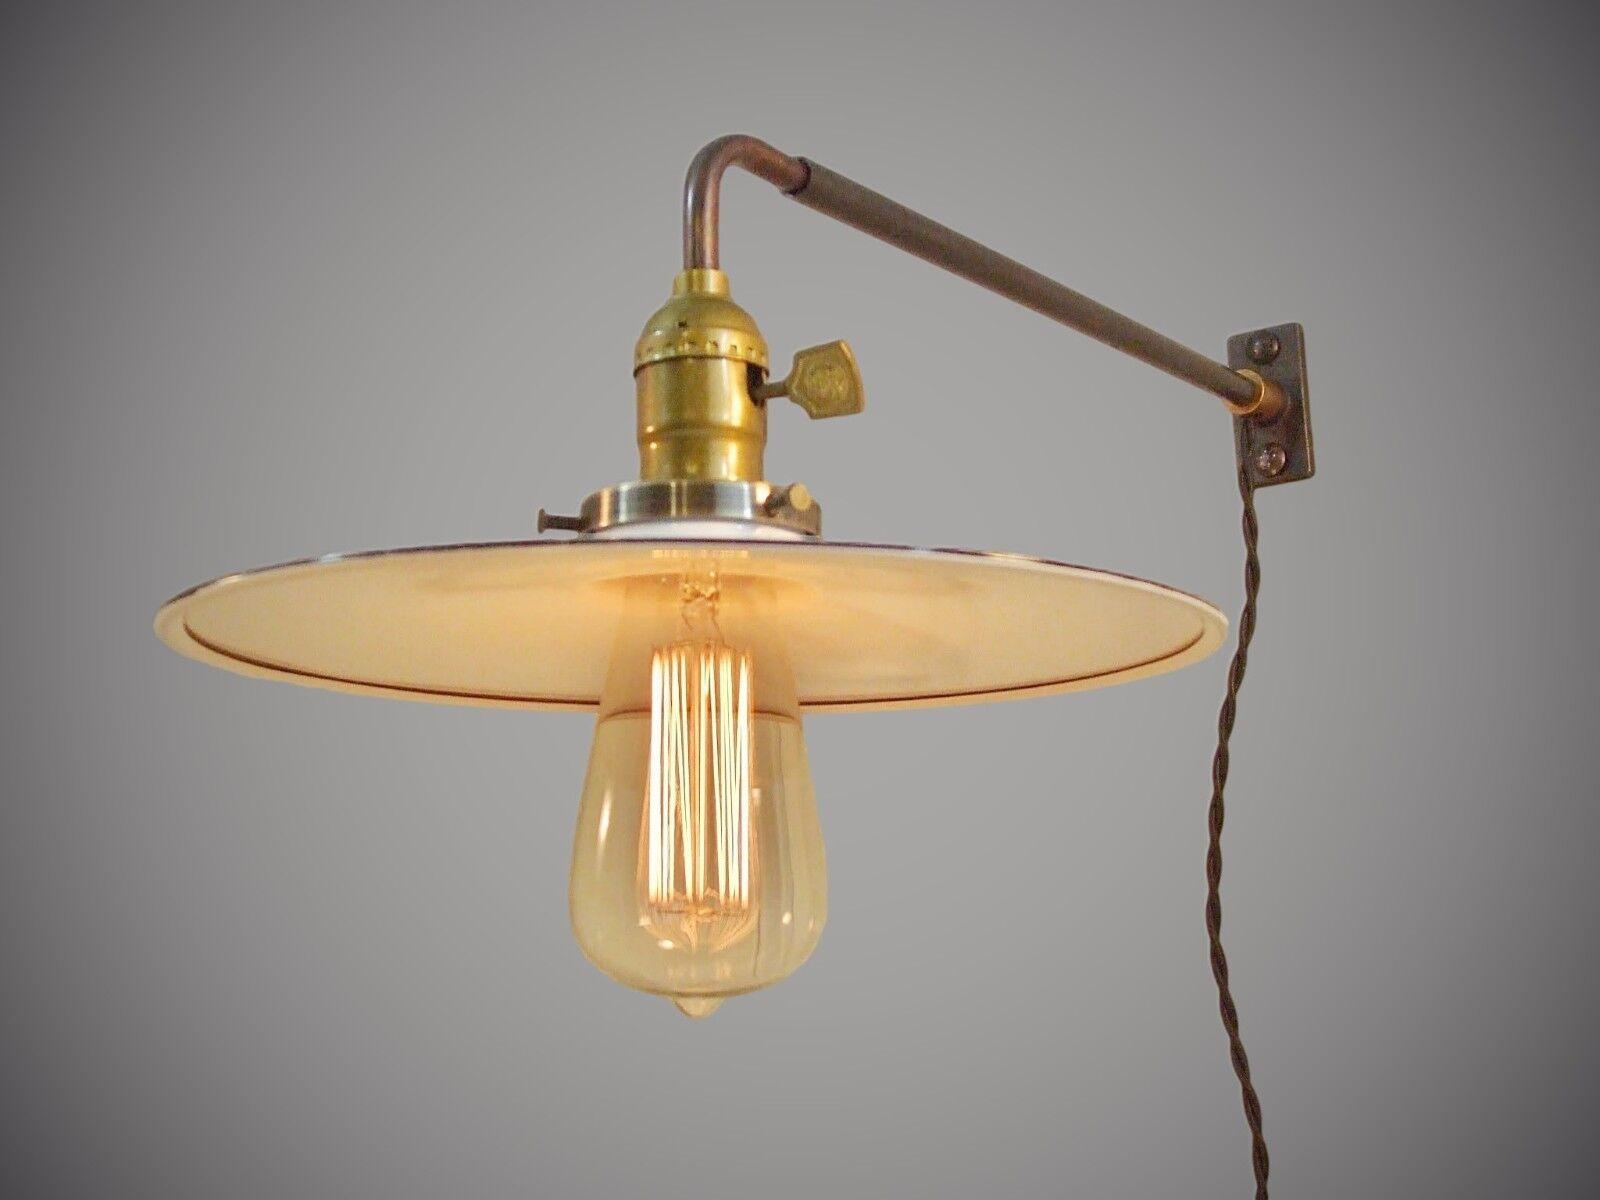 vintage industrial wall mount light flat steel shade. Black Bedroom Furniture Sets. Home Design Ideas